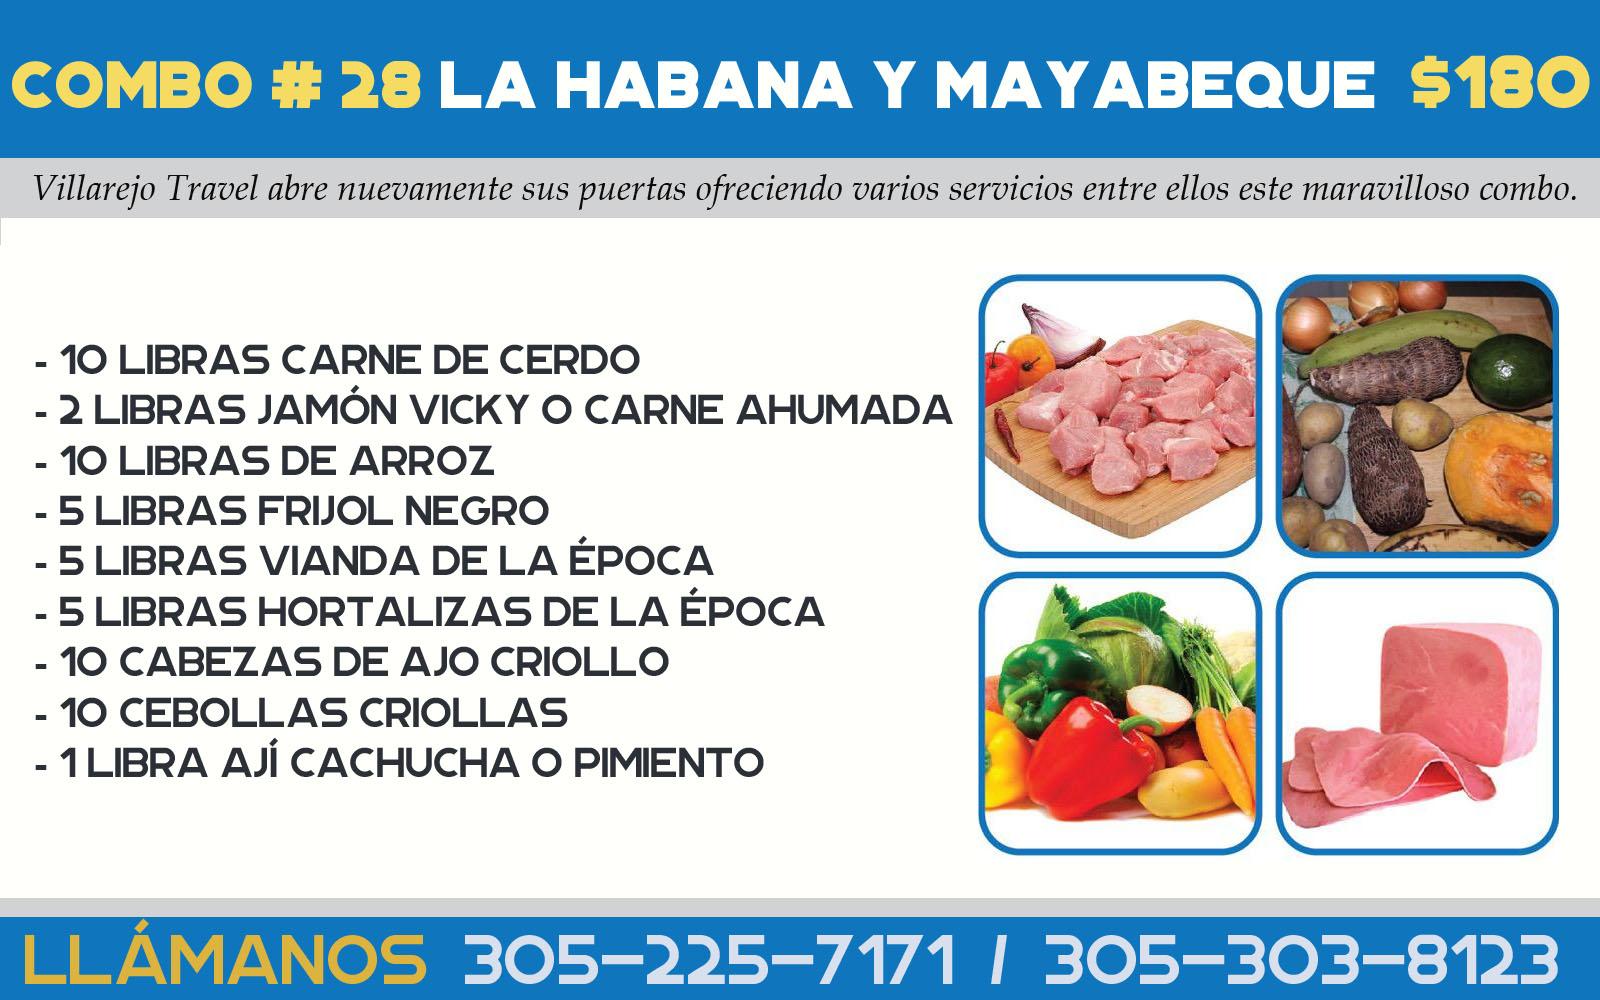 Combo #28 Habana y Mayabeque